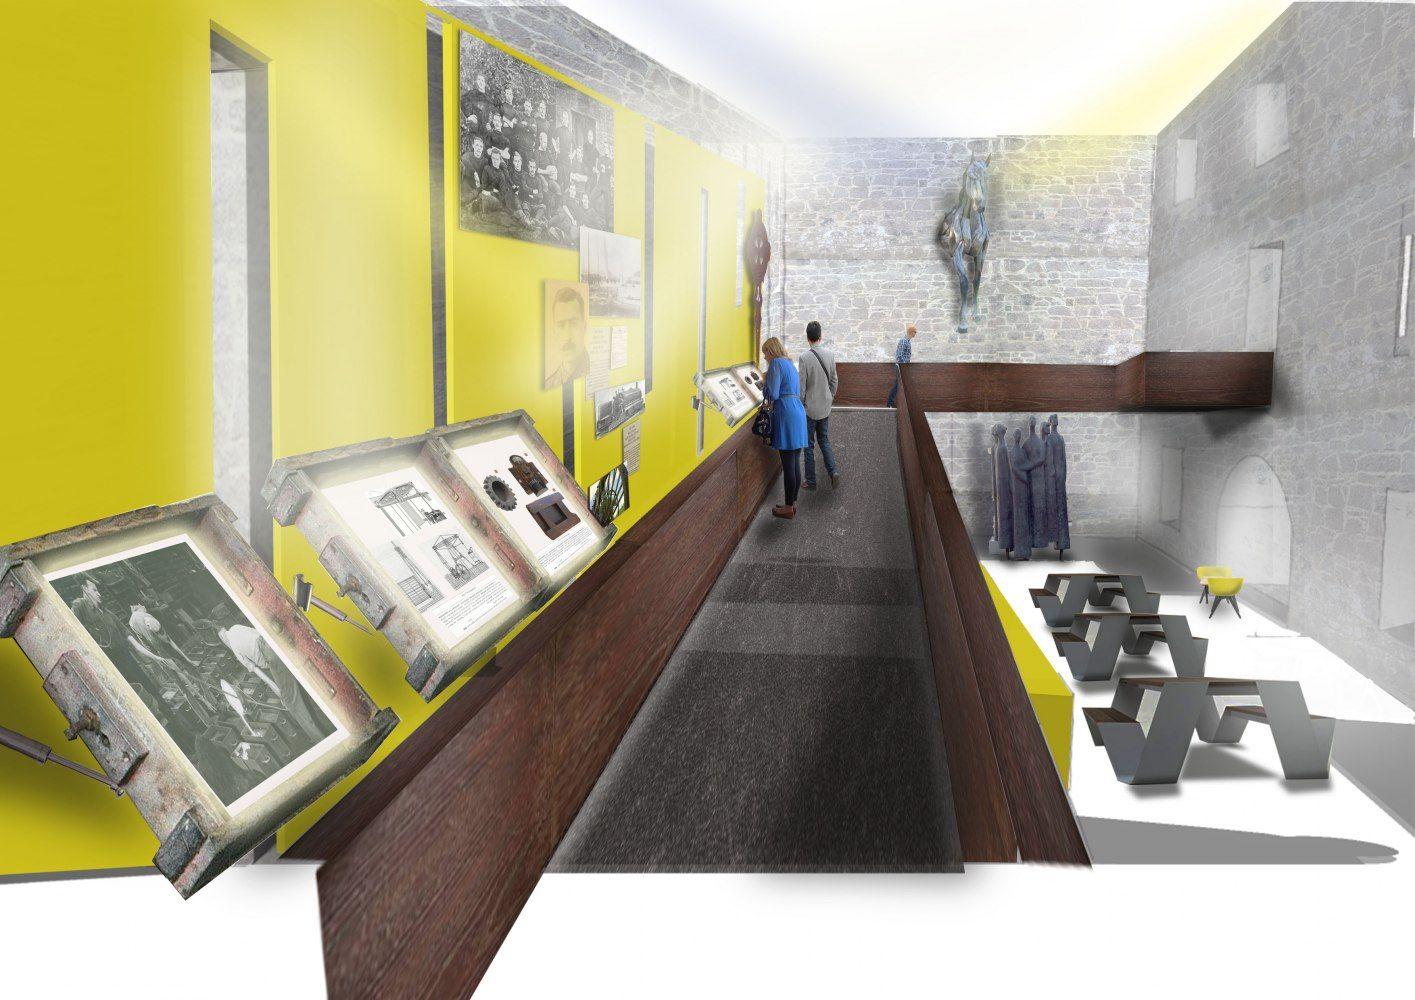 walkway by helen jackson interior design ba hons portfolio rh pinterest com Interior Design College Campuses Interior Design Office